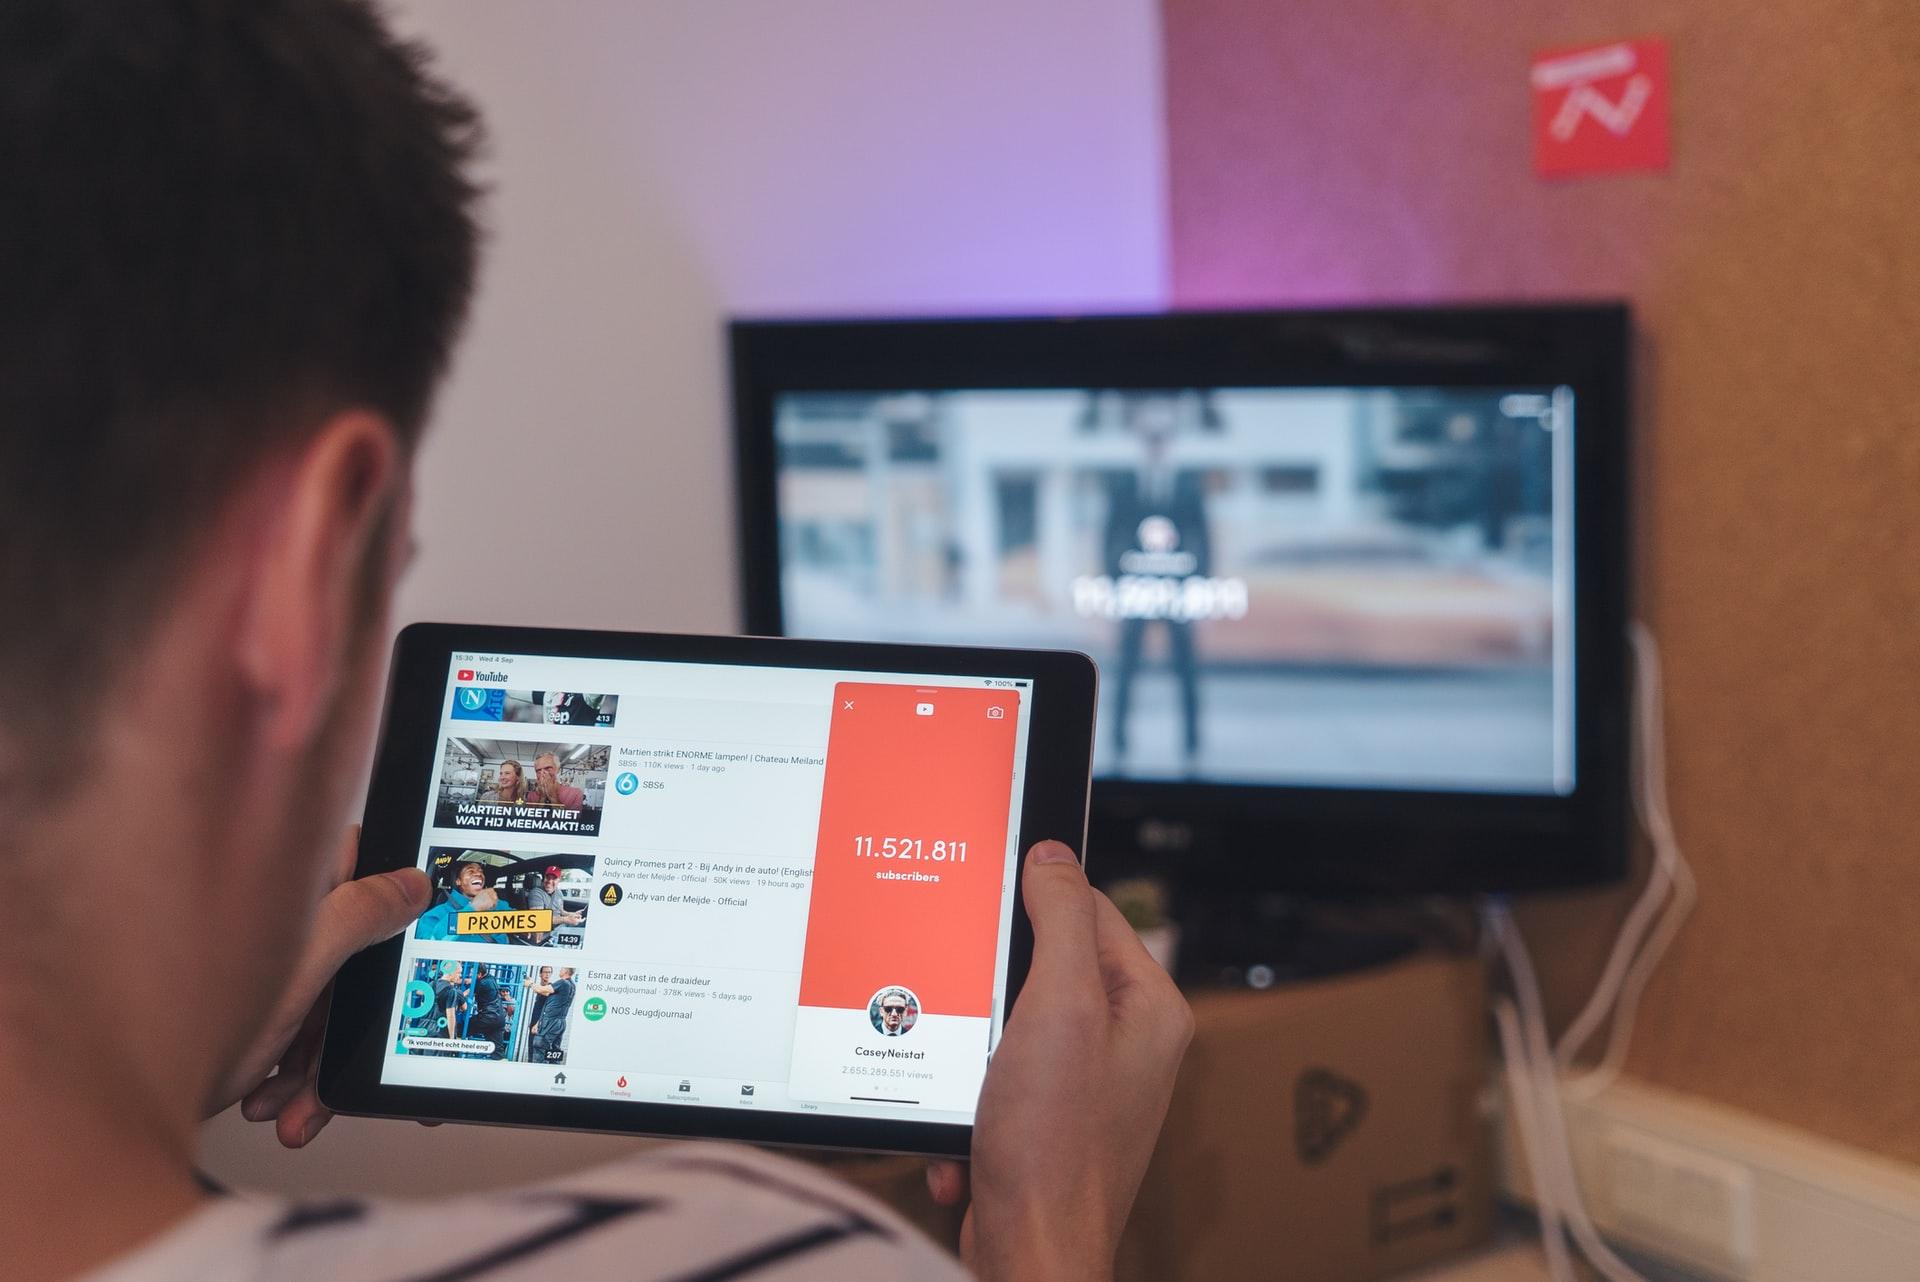 YouTubeを見る男性